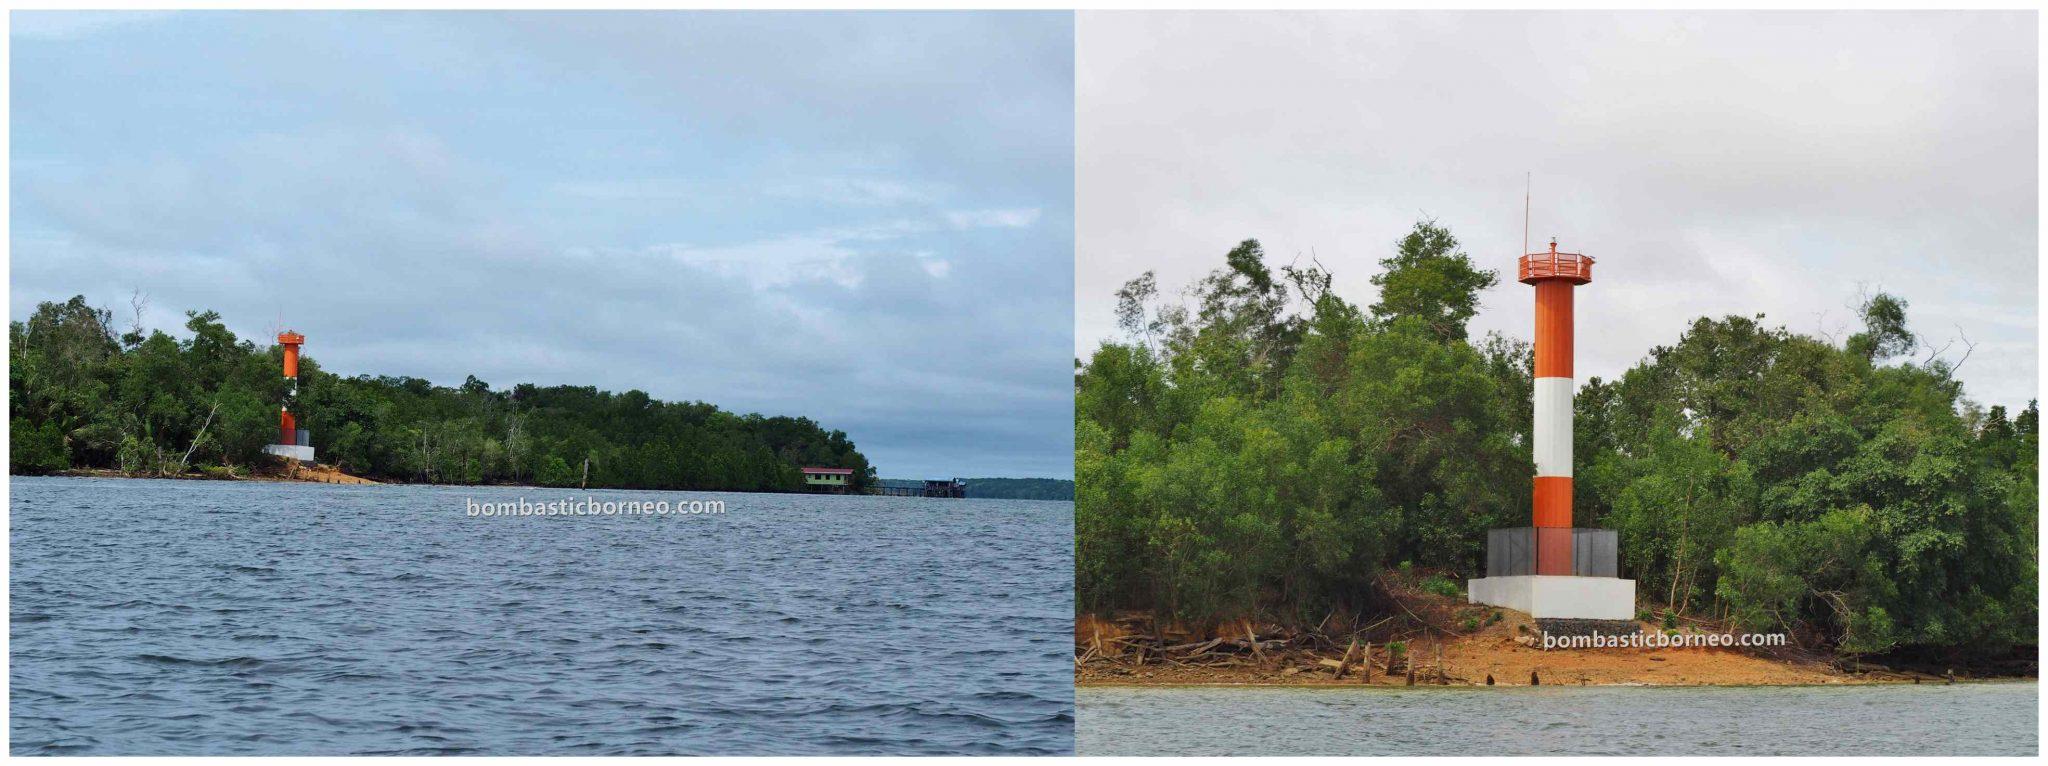 rumah api, Island, boat ride, jelajah, exploration, adventure, backpackers, tourism, tourist attraction, Cross Border, Borneo, 跨境婆罗洲游踪, 马来西亚沙巴斗湖